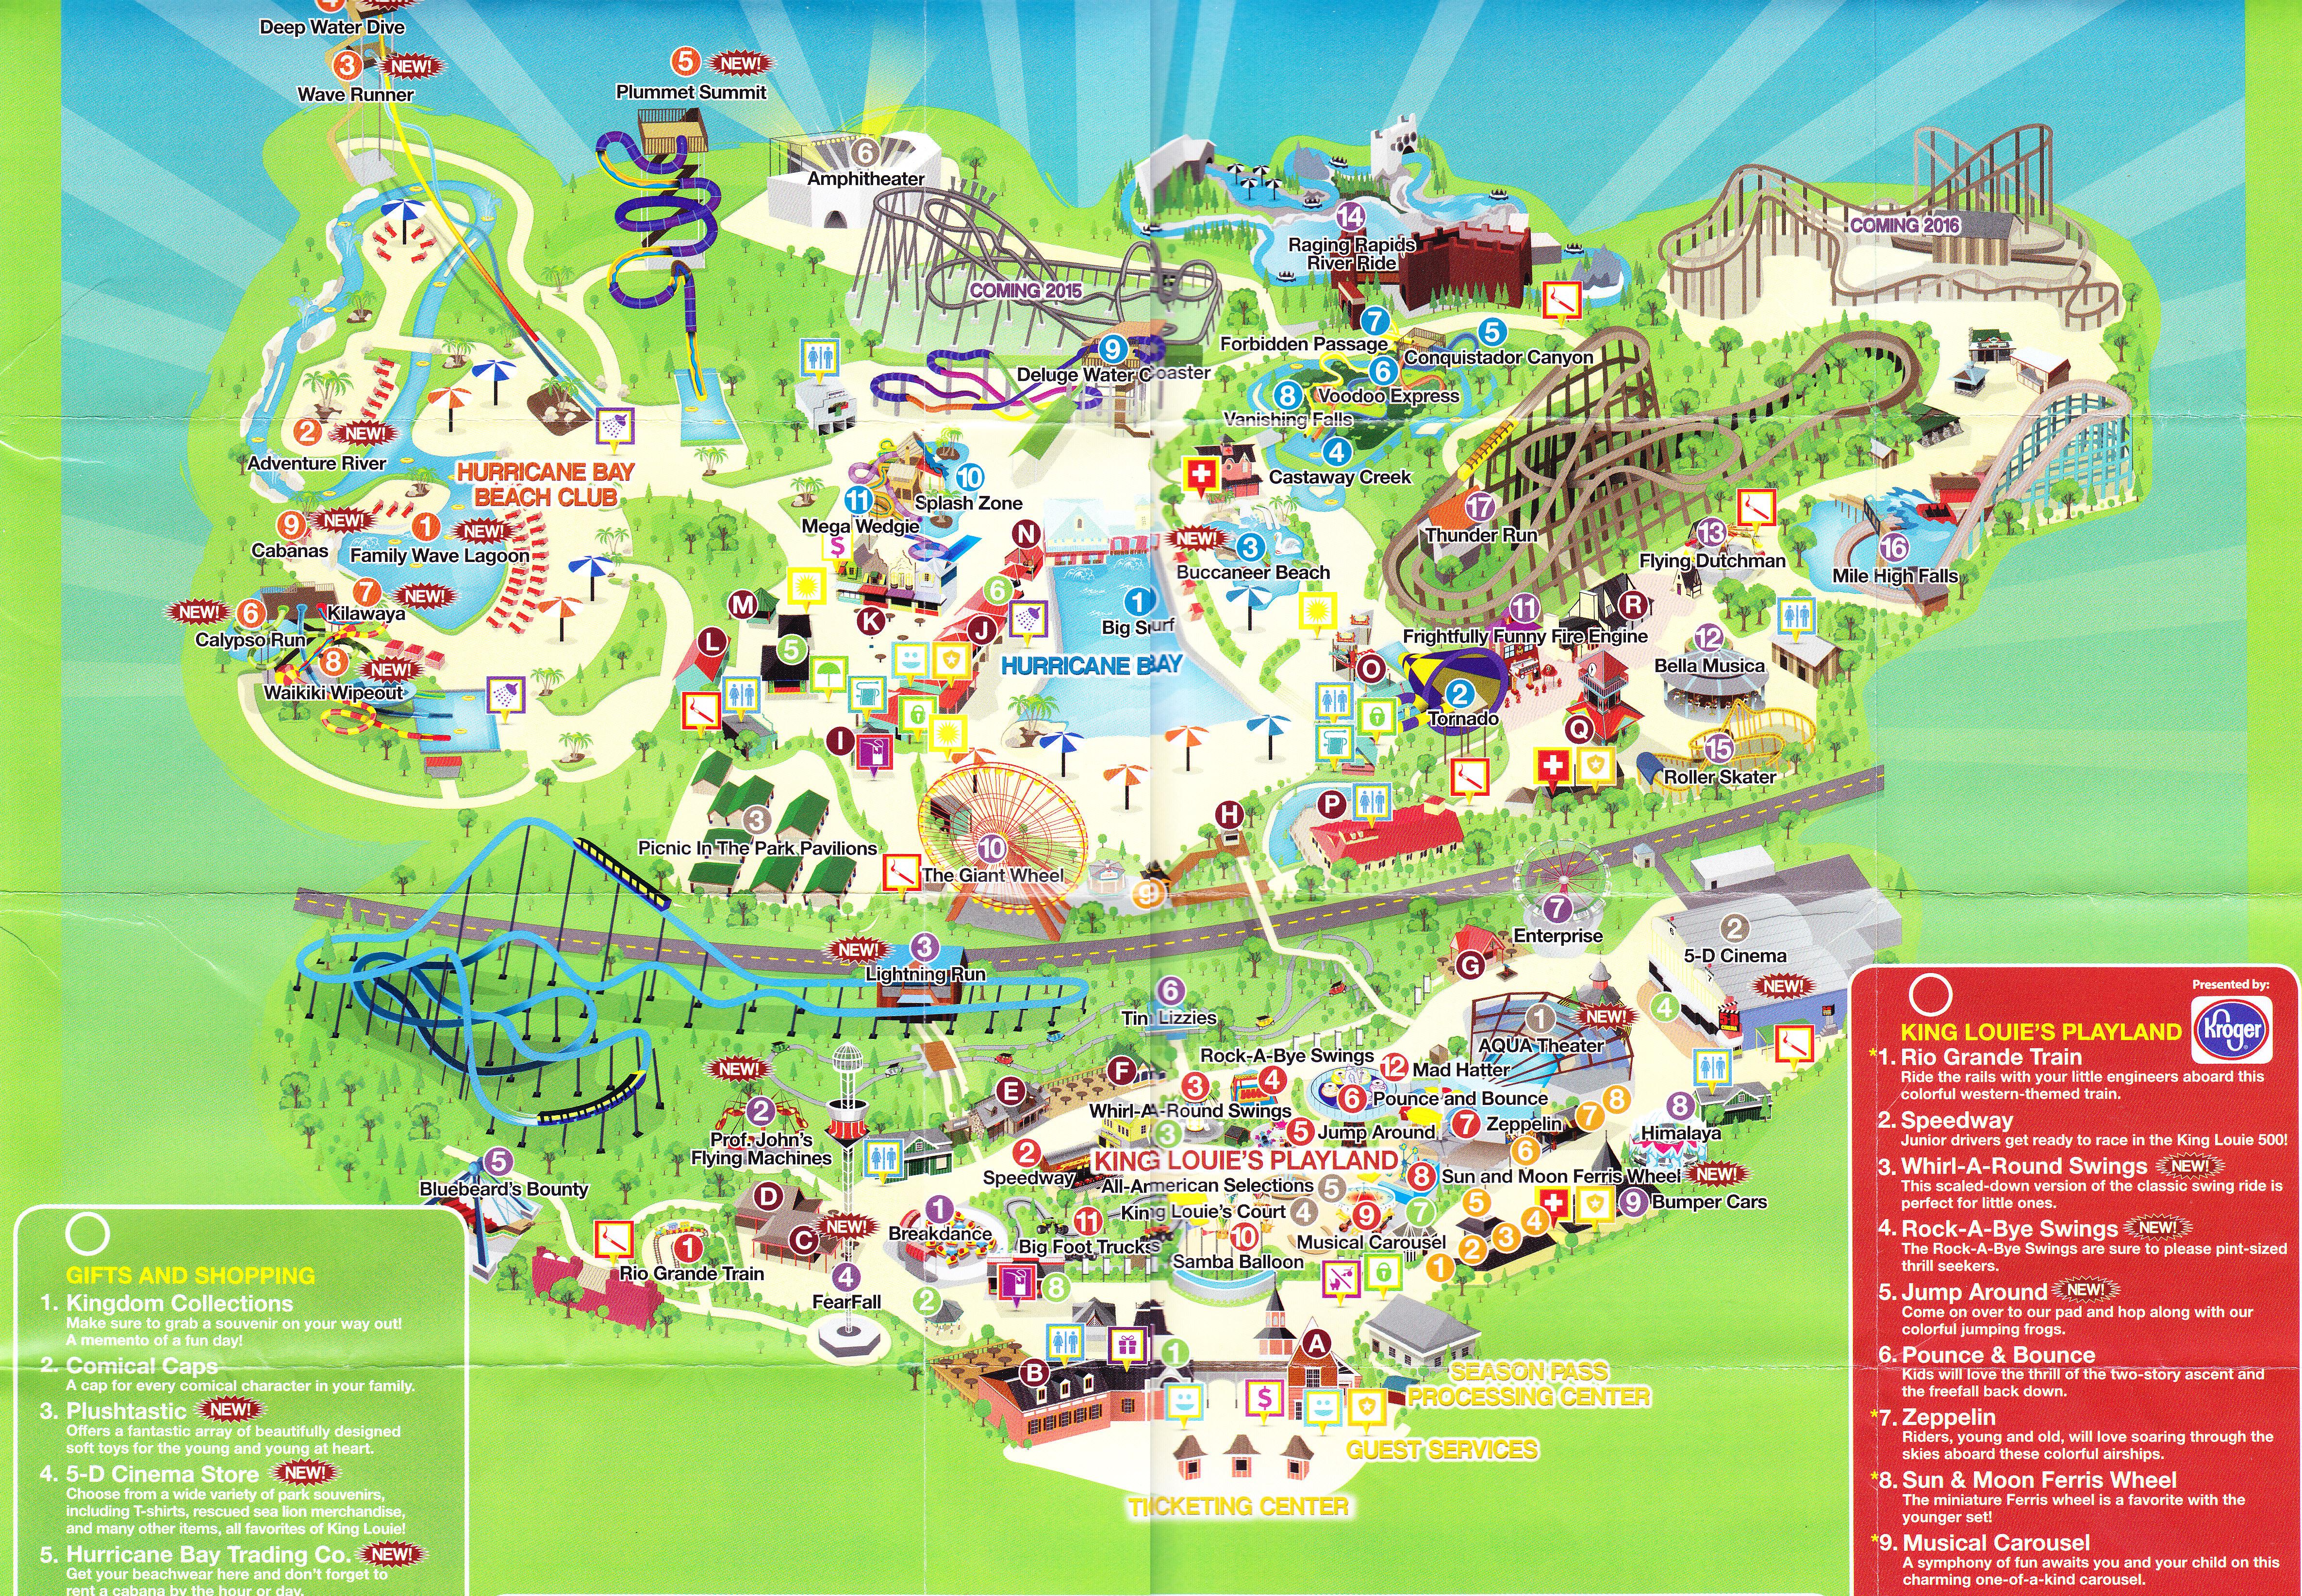 Kentucky Kingdom - 2014 Park Map